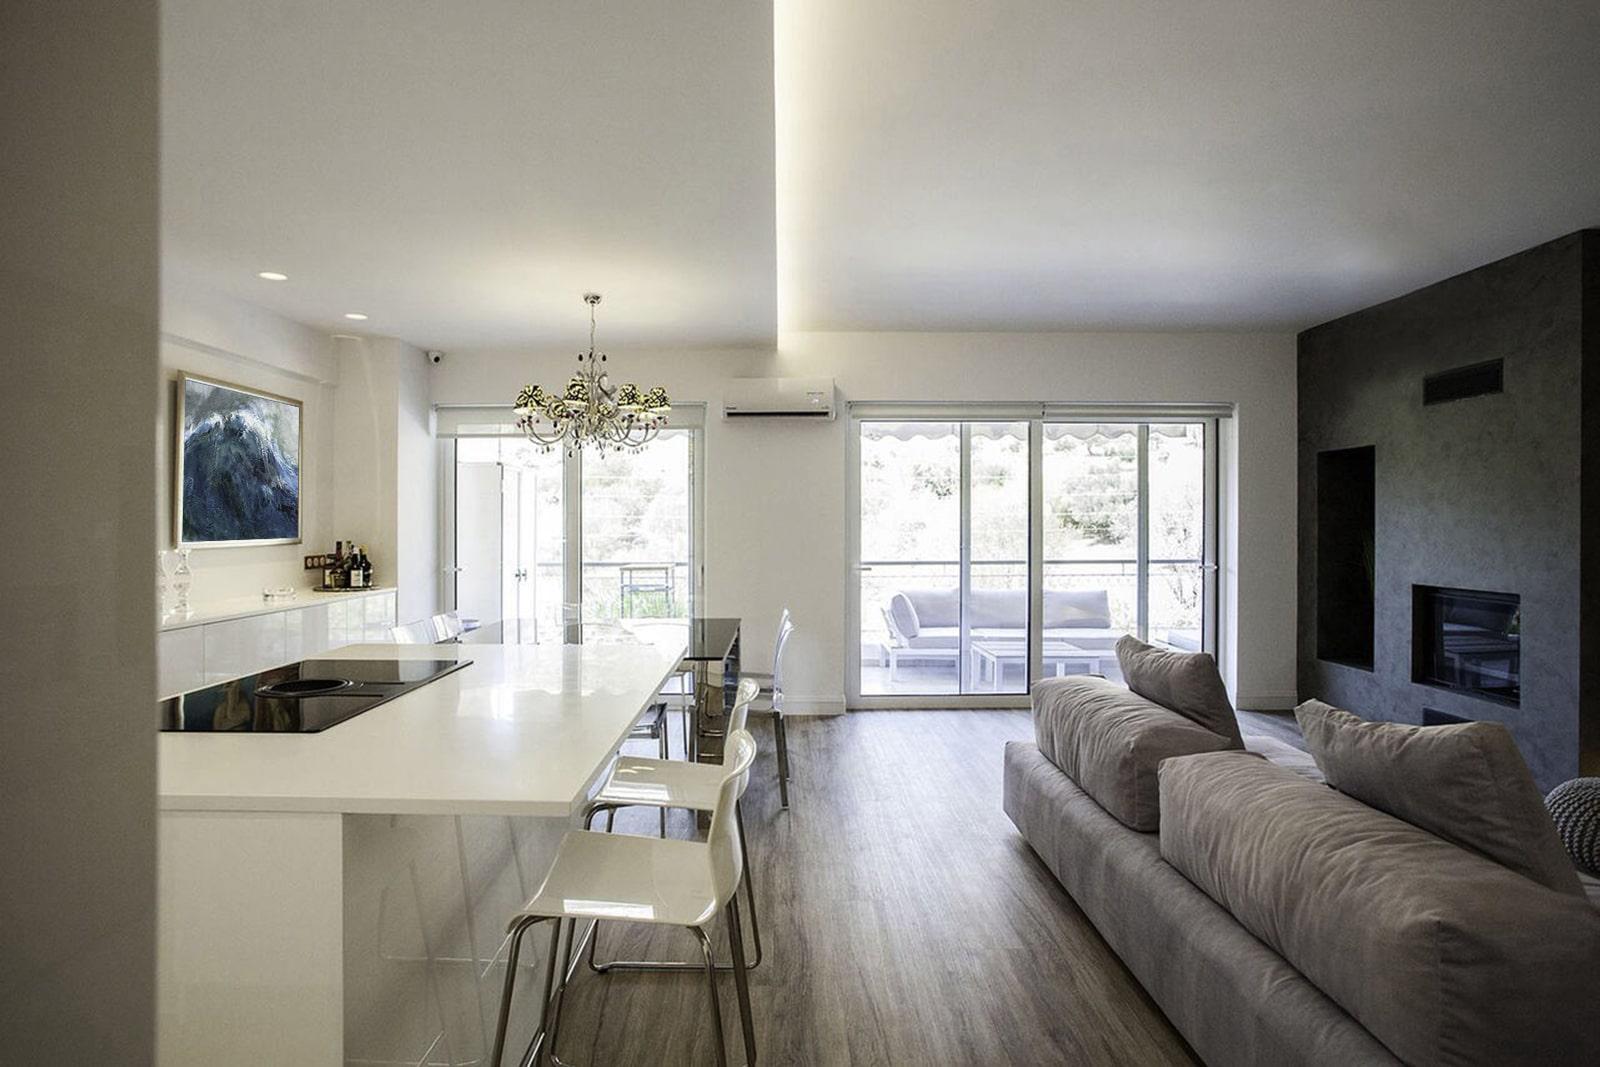 Open kitchen design - the gem apartment